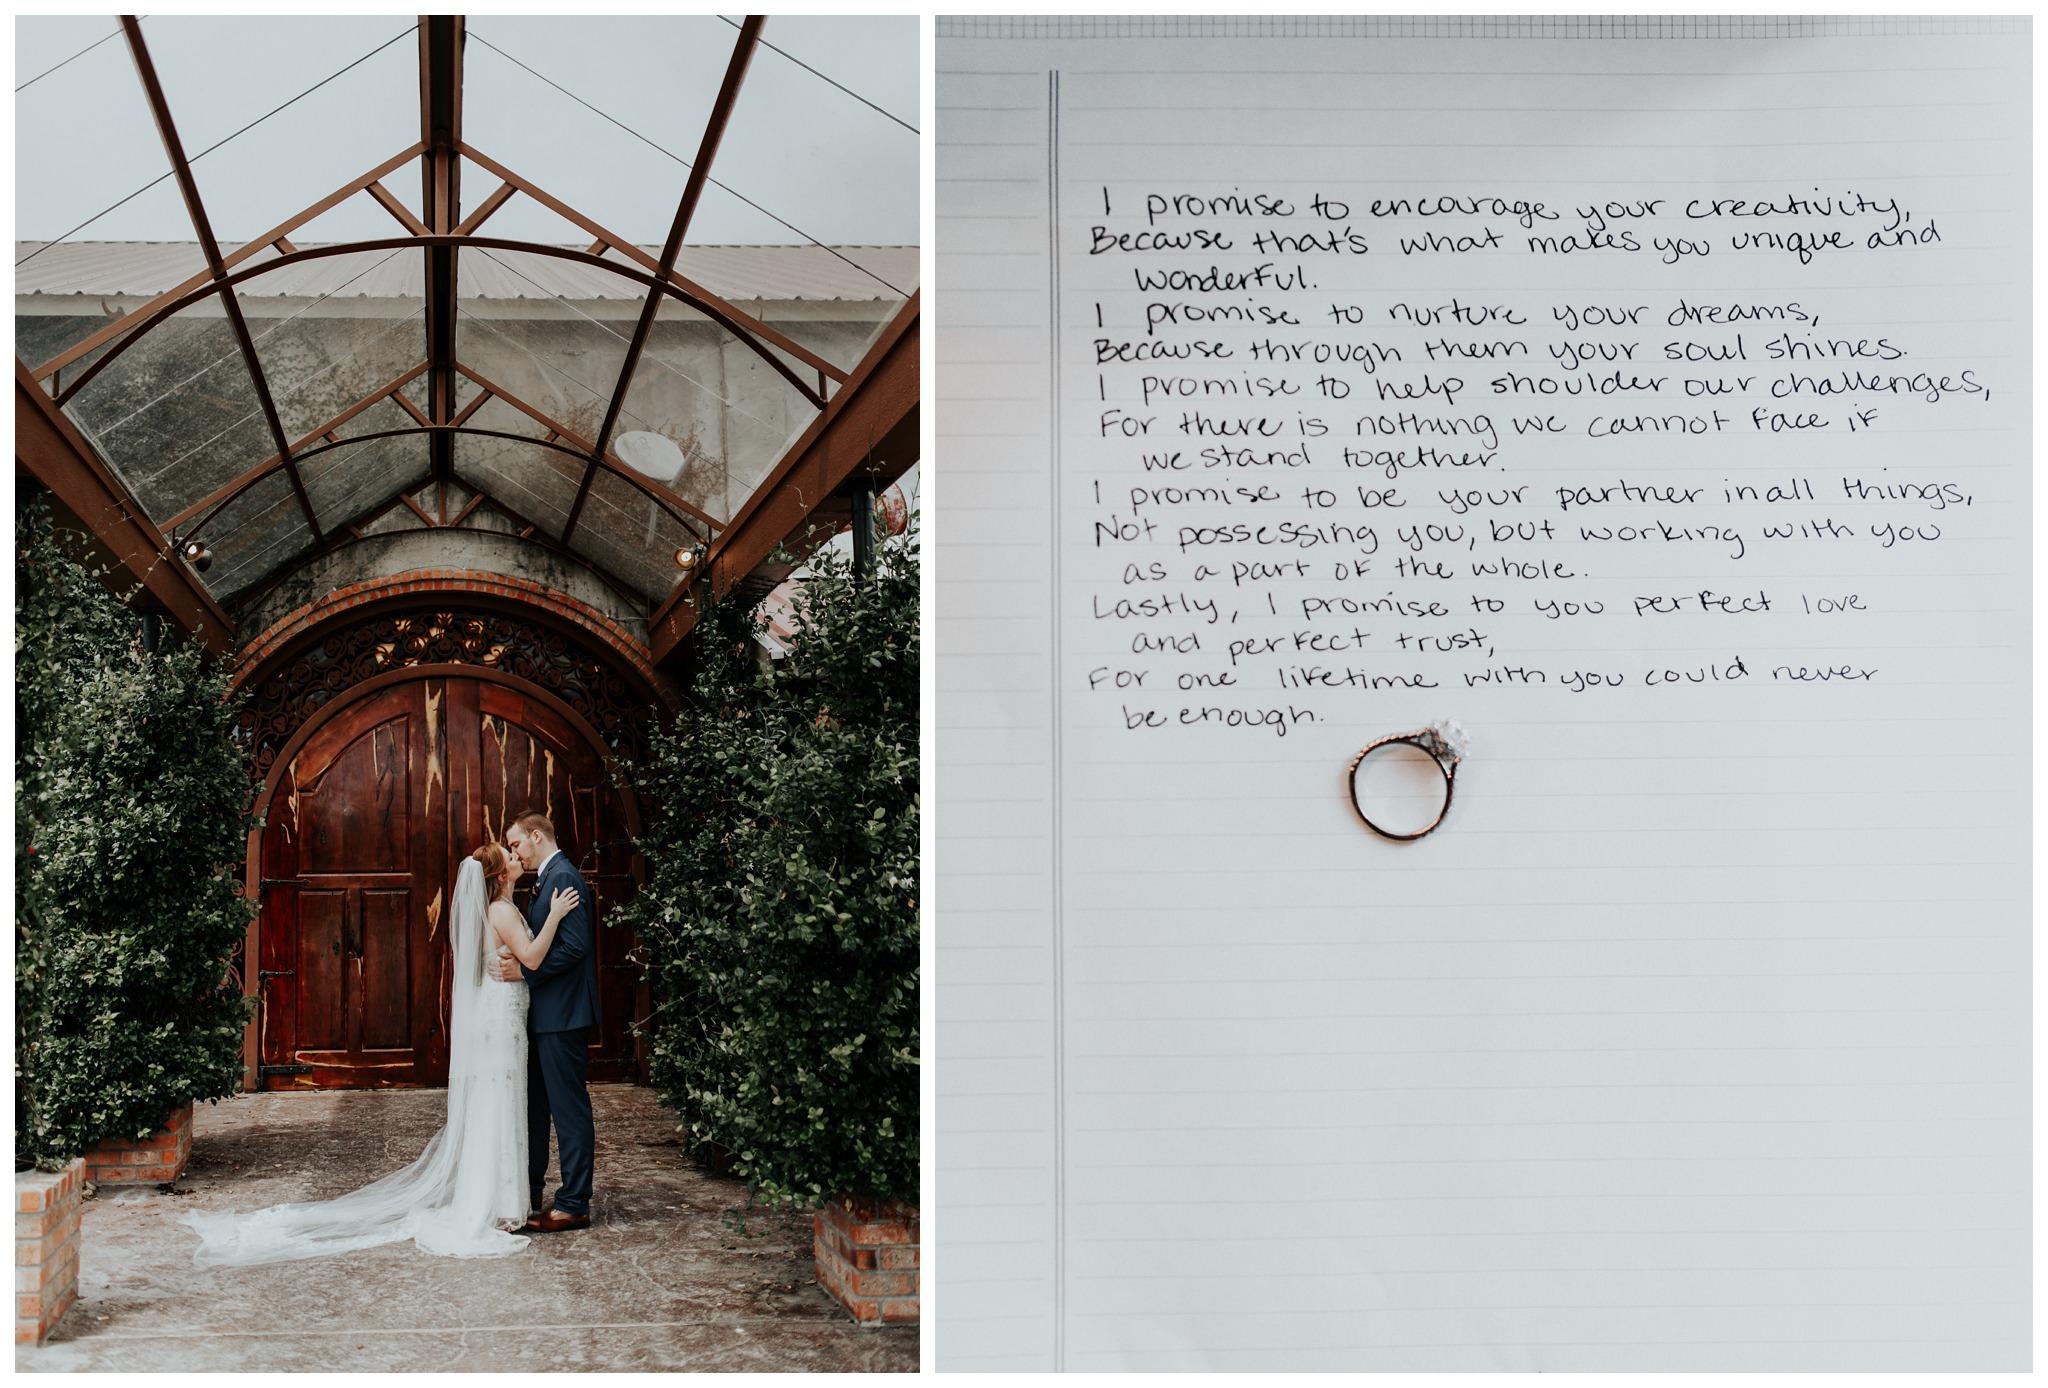 Summertime Olde Dobbin Station - Magnolia Wedding - The Woodlands Texas Wedding Photographer-2464.jpg